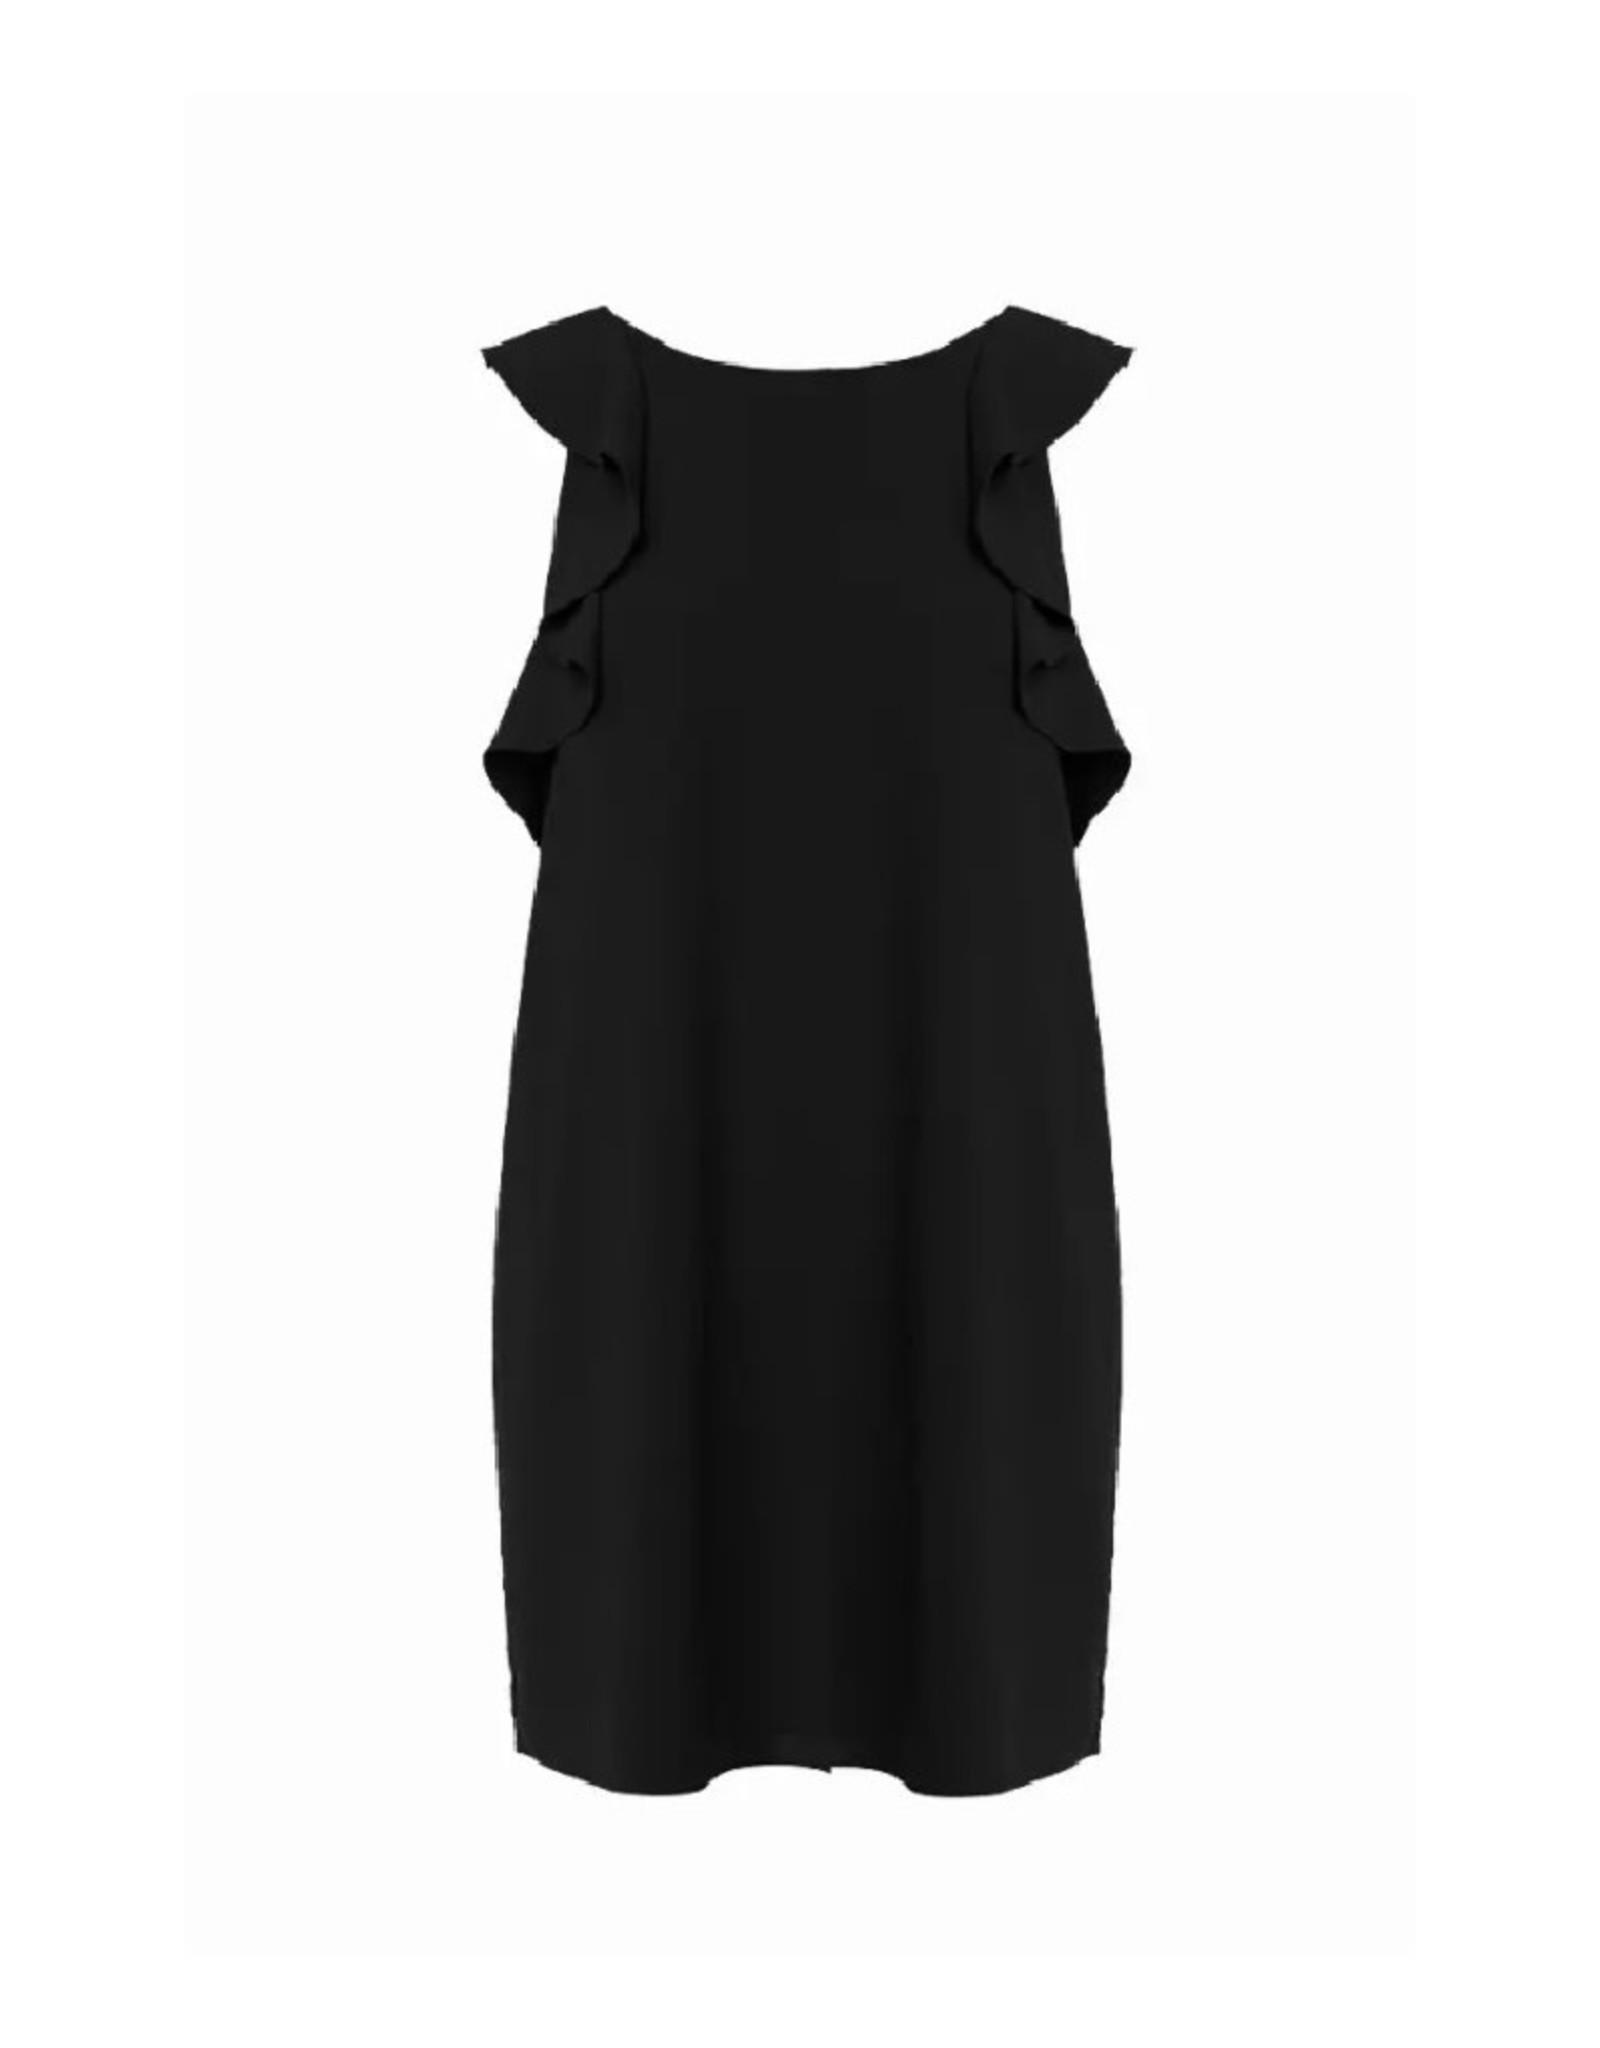 Ruffle Sleeve V-Back Dress - Black